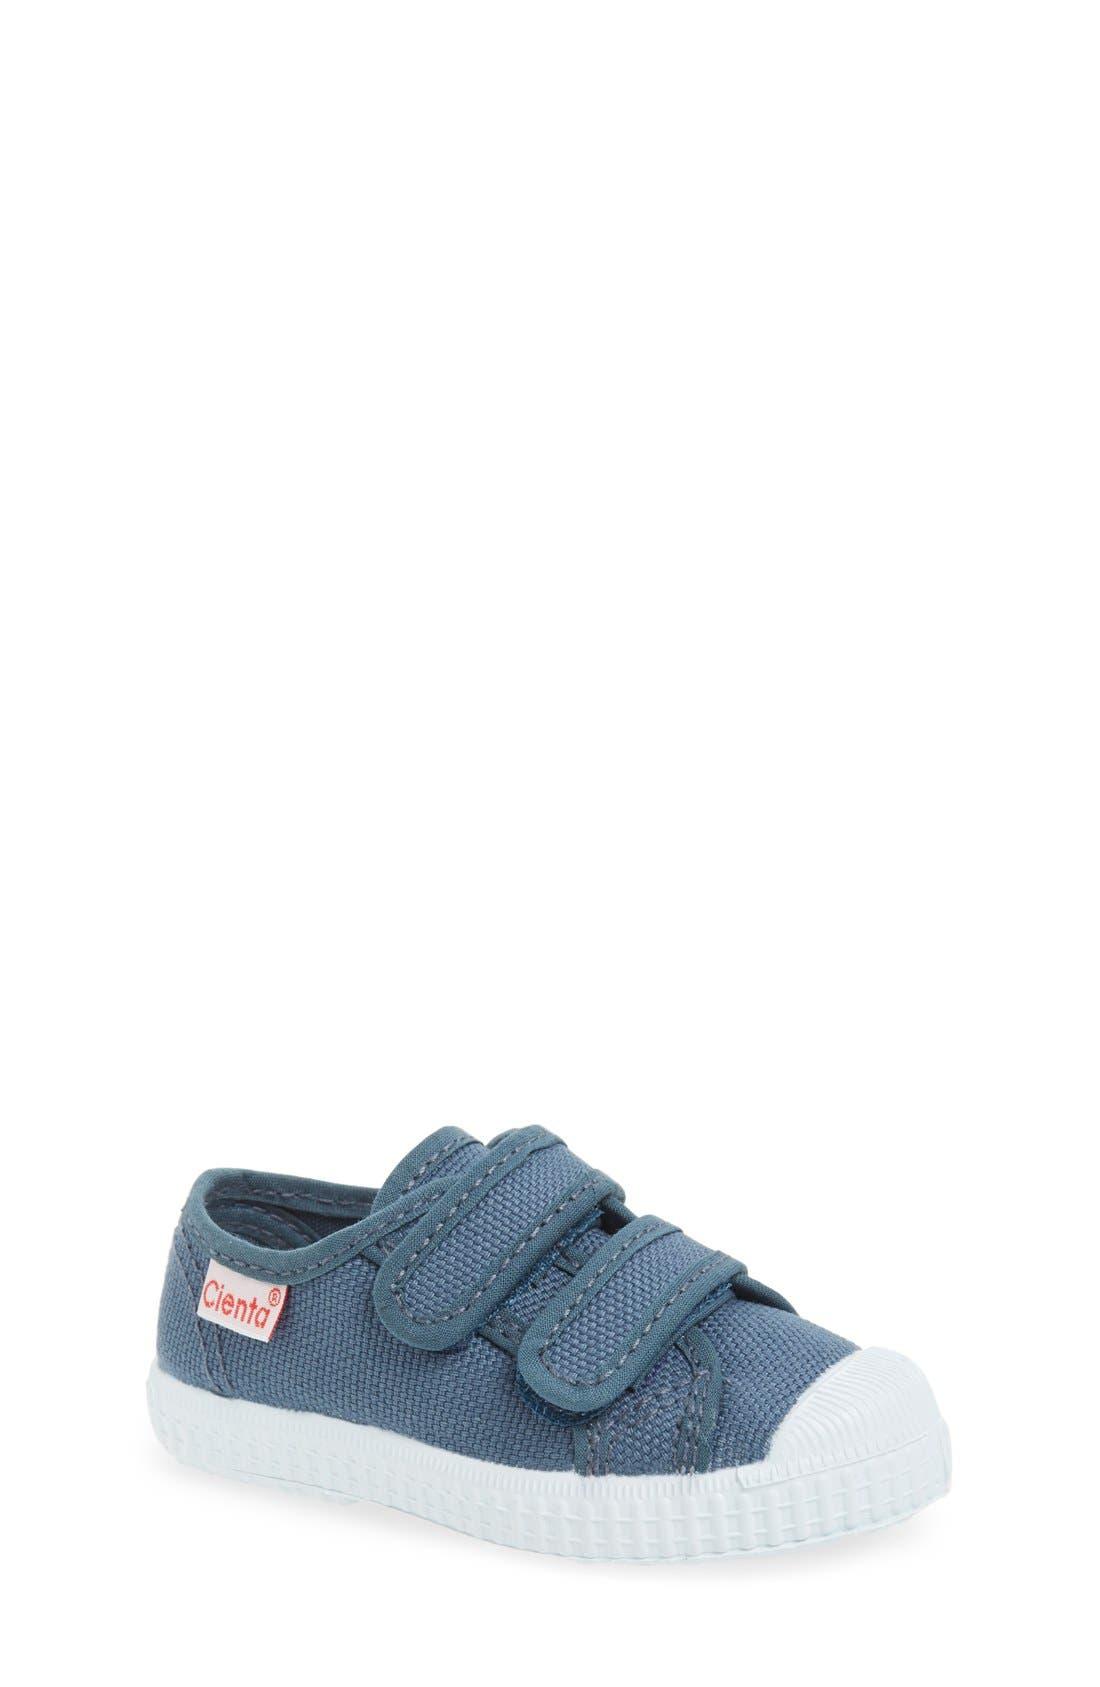 Cienta Canvas Sneaker (Walker & Toddler)